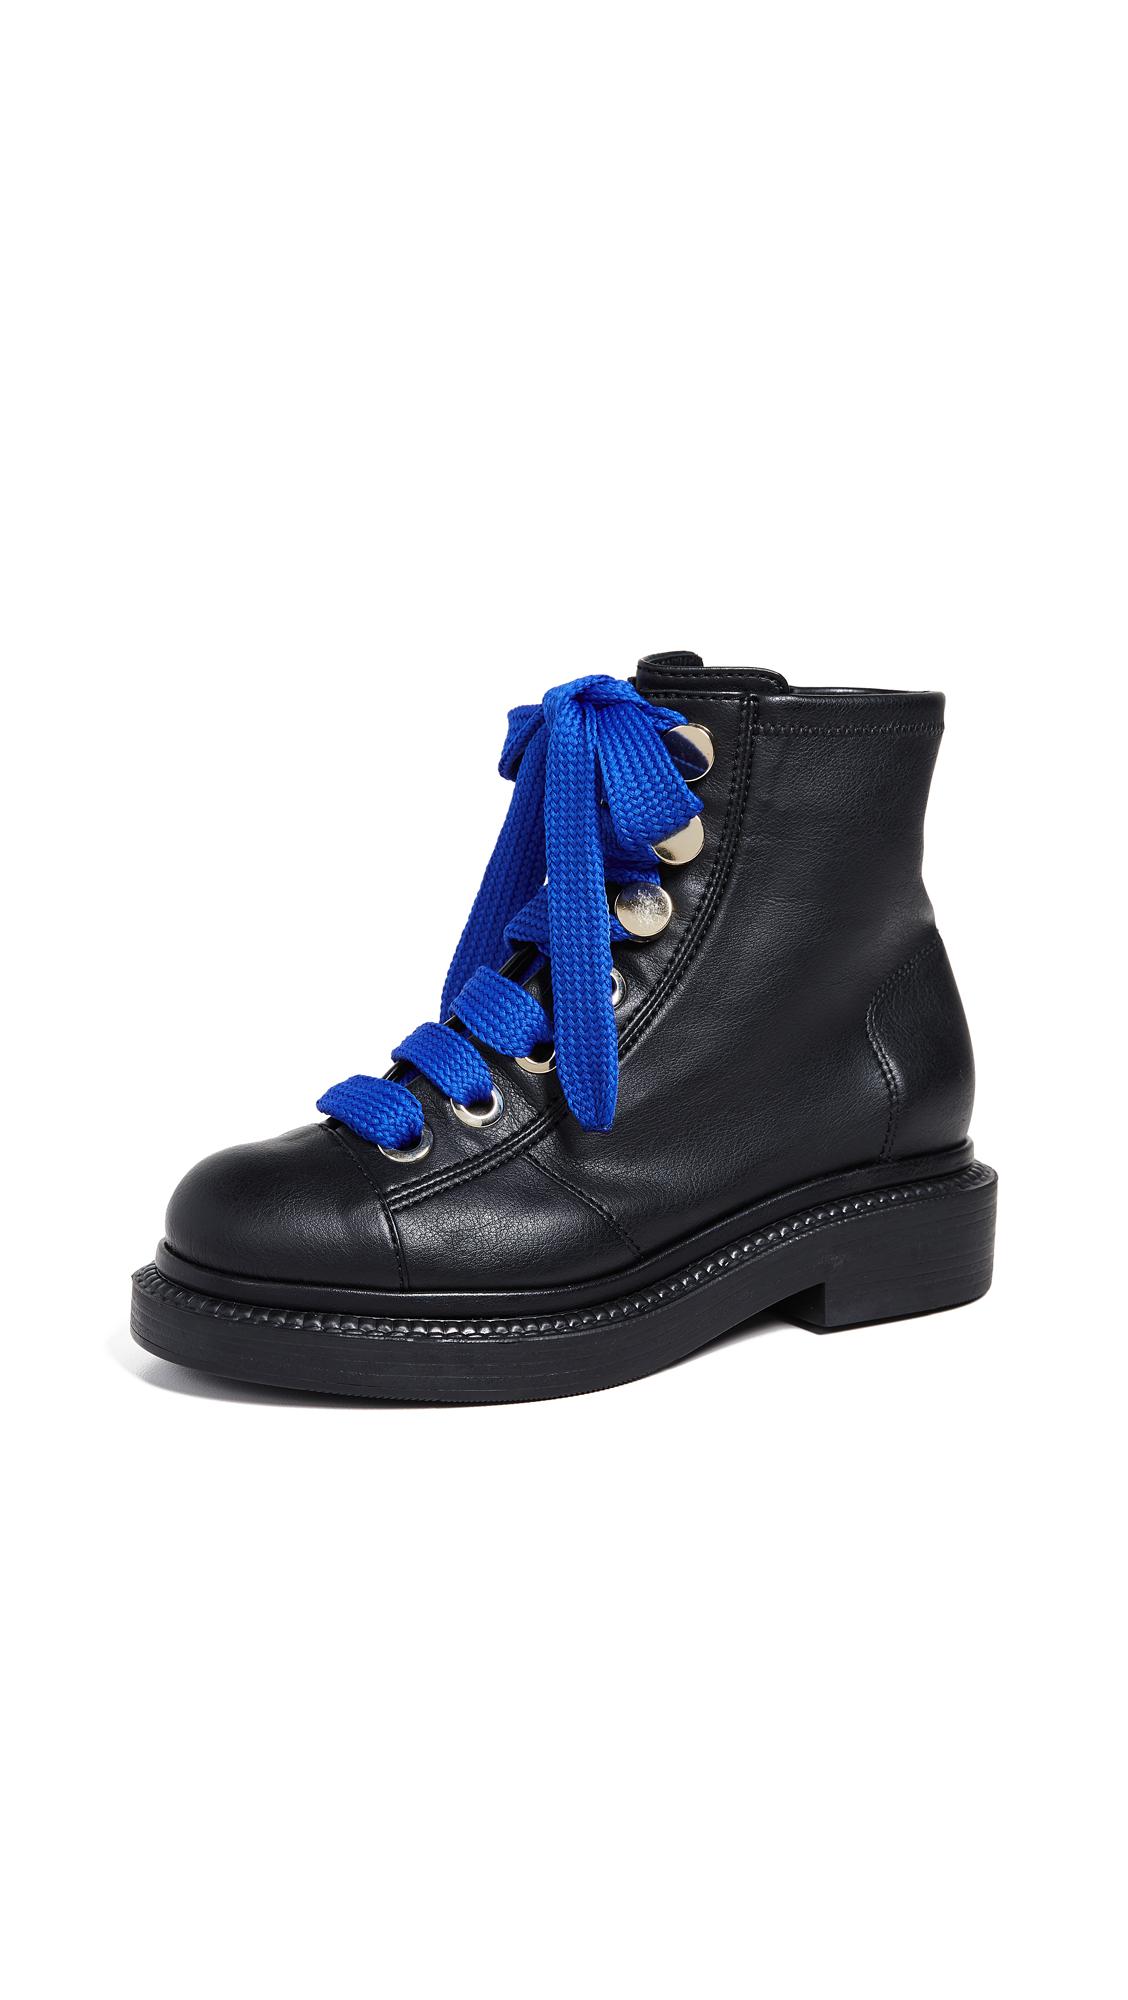 Greymer Queen Boots - Roxy Nero